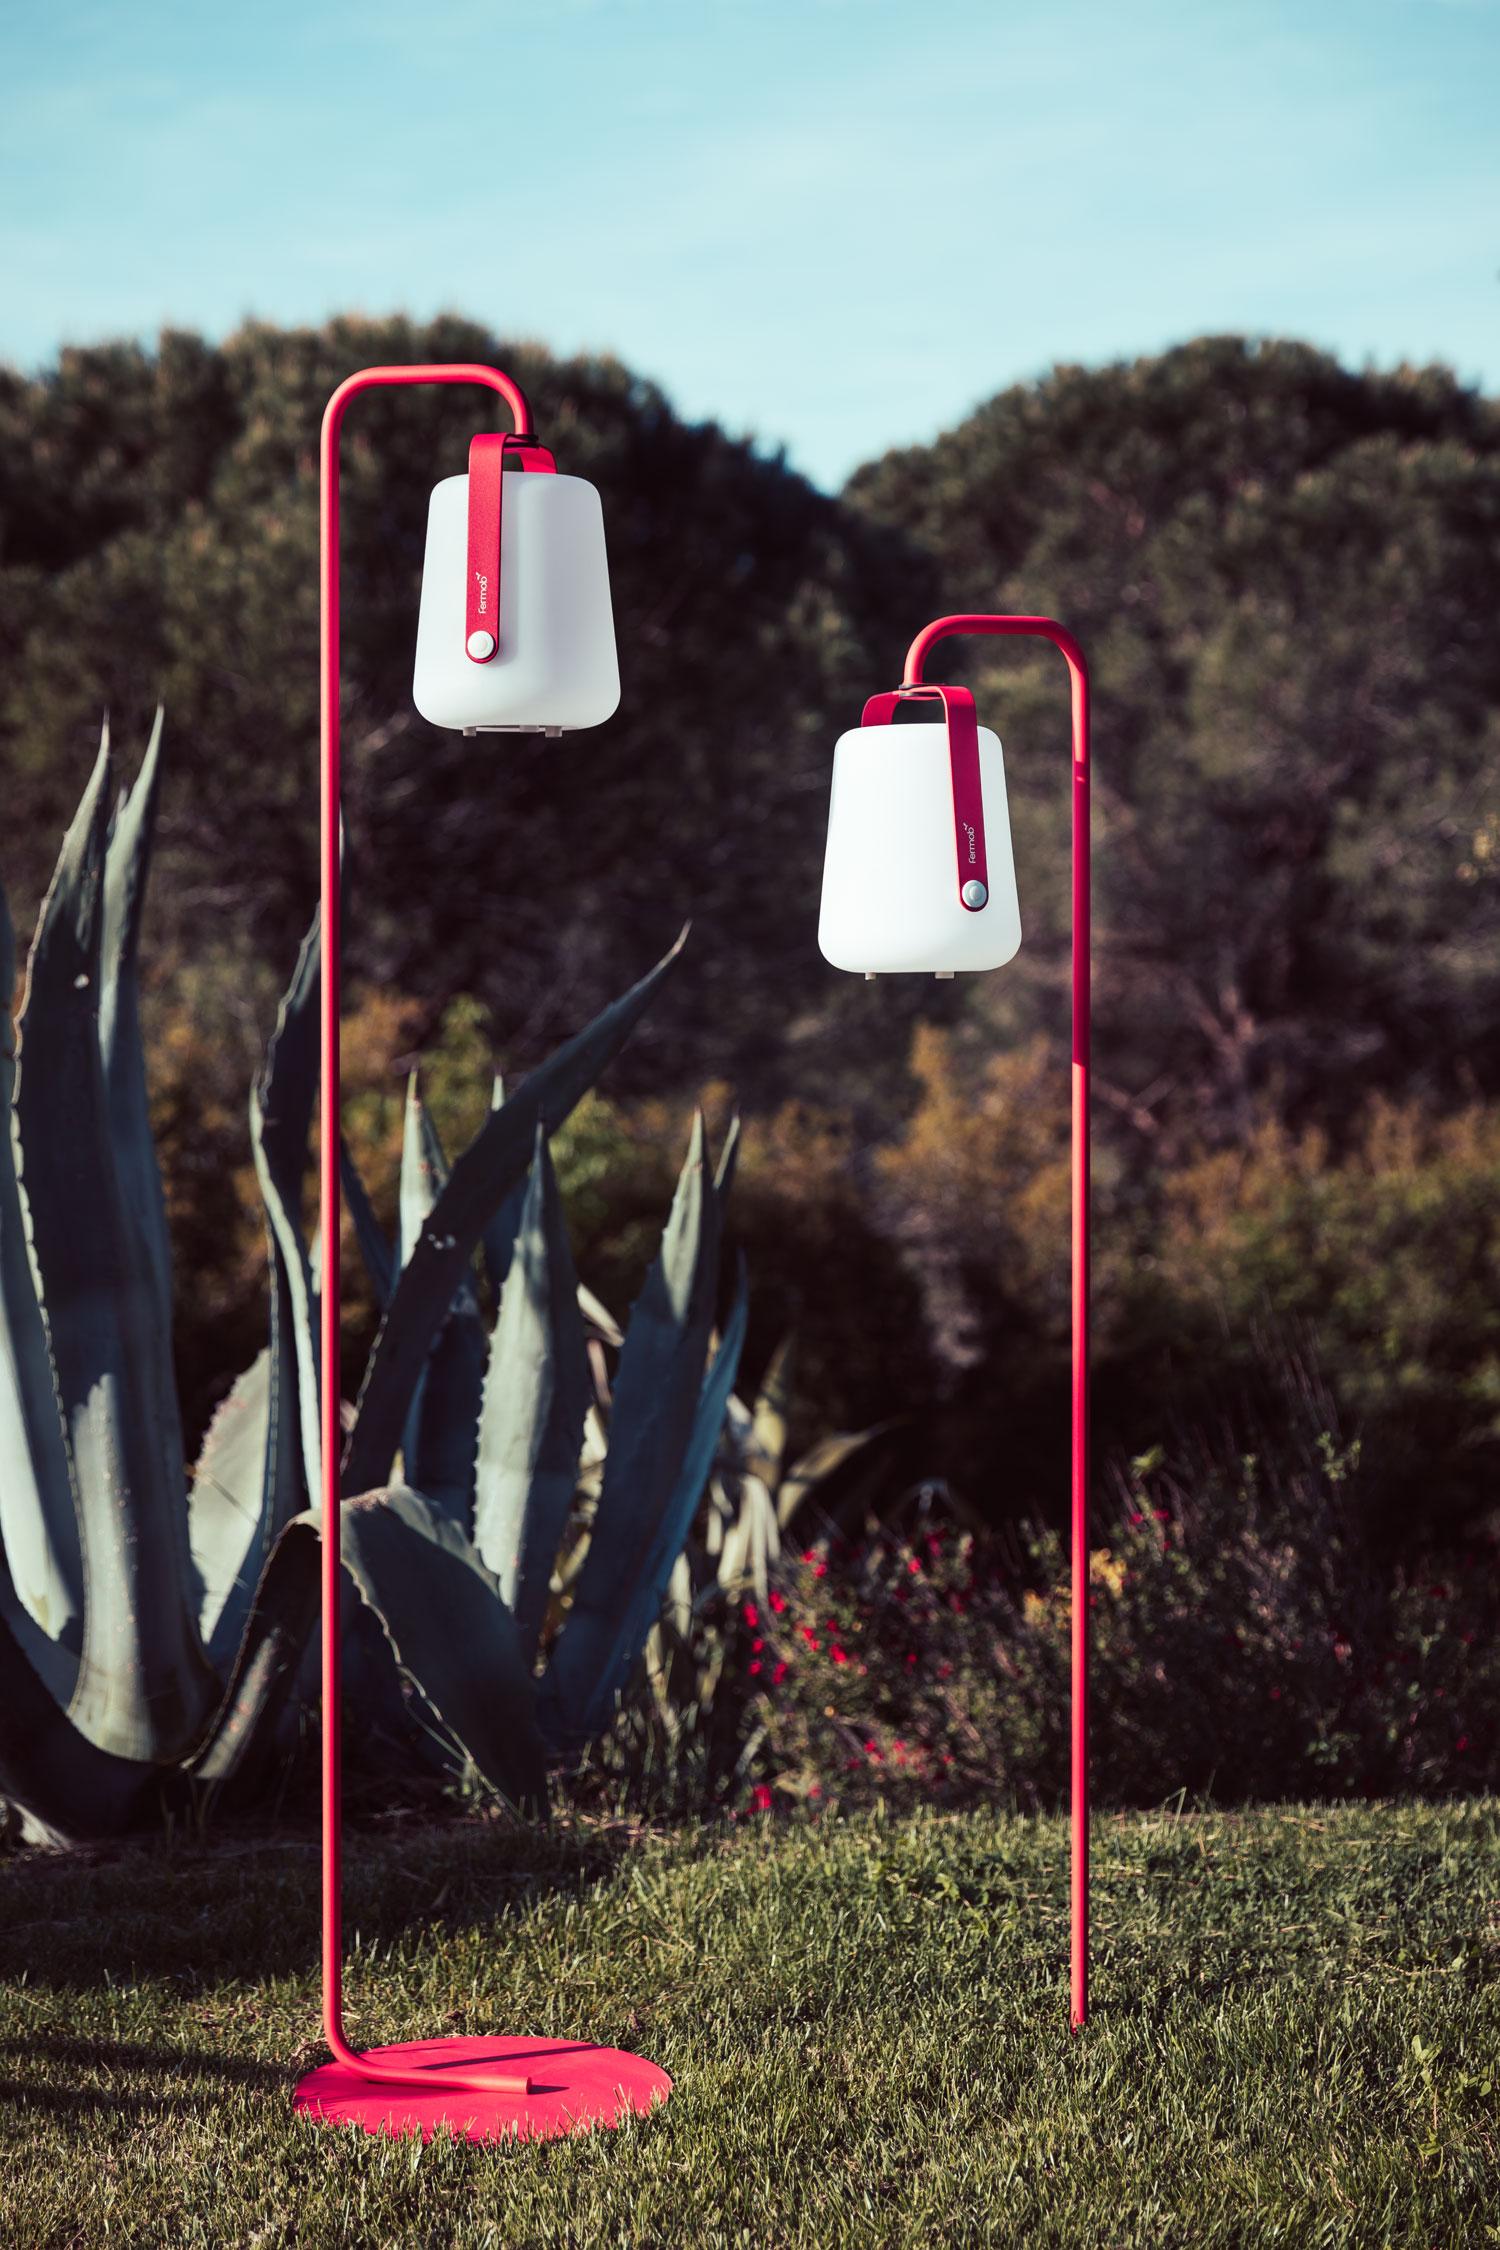 lampe nomade, pied lampe balad, lampe sans fil, lampe de jardin, fermob